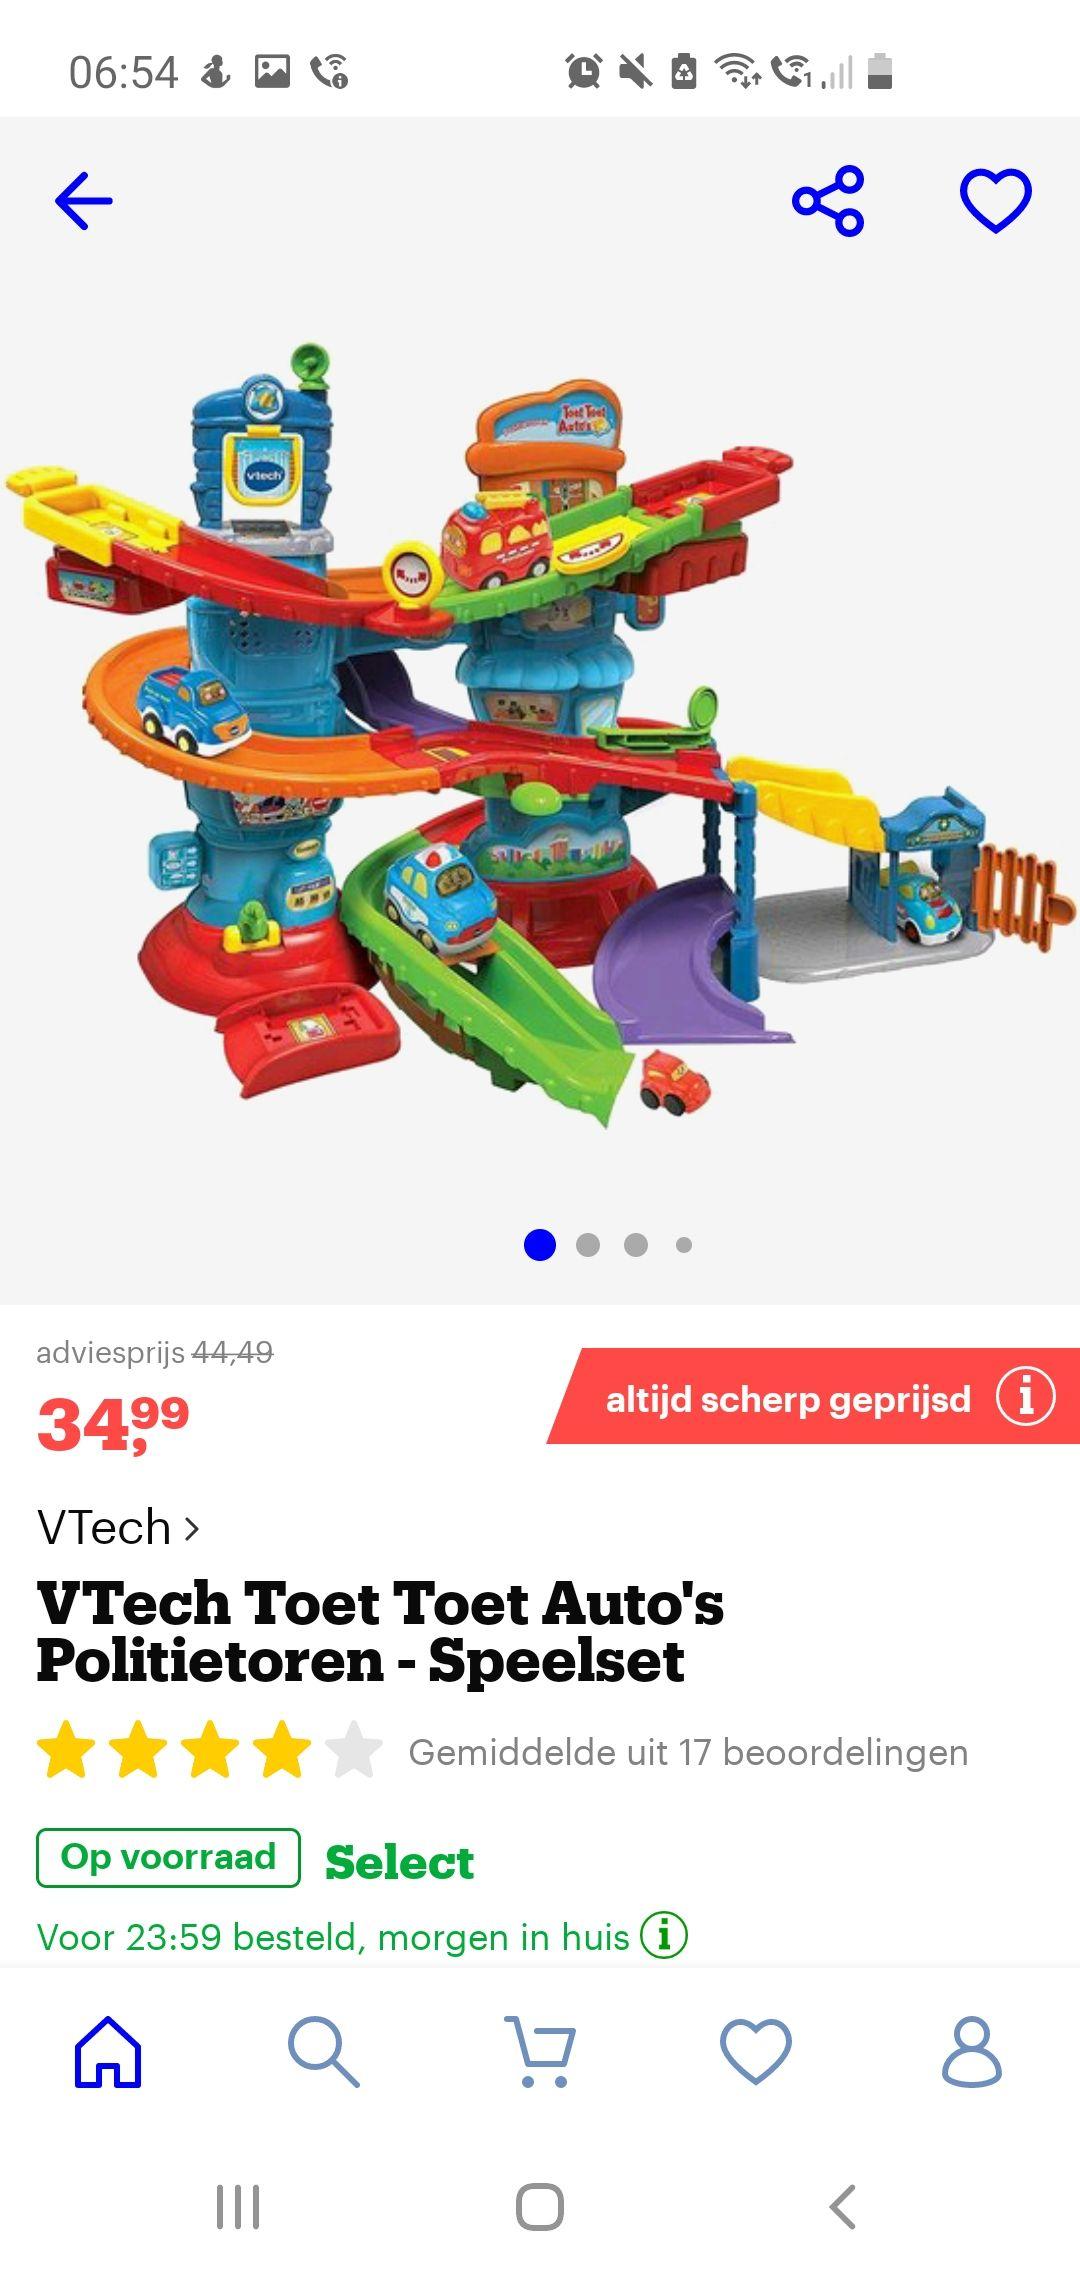 VTech Toet Toet Auto's Politietoren - Speelset